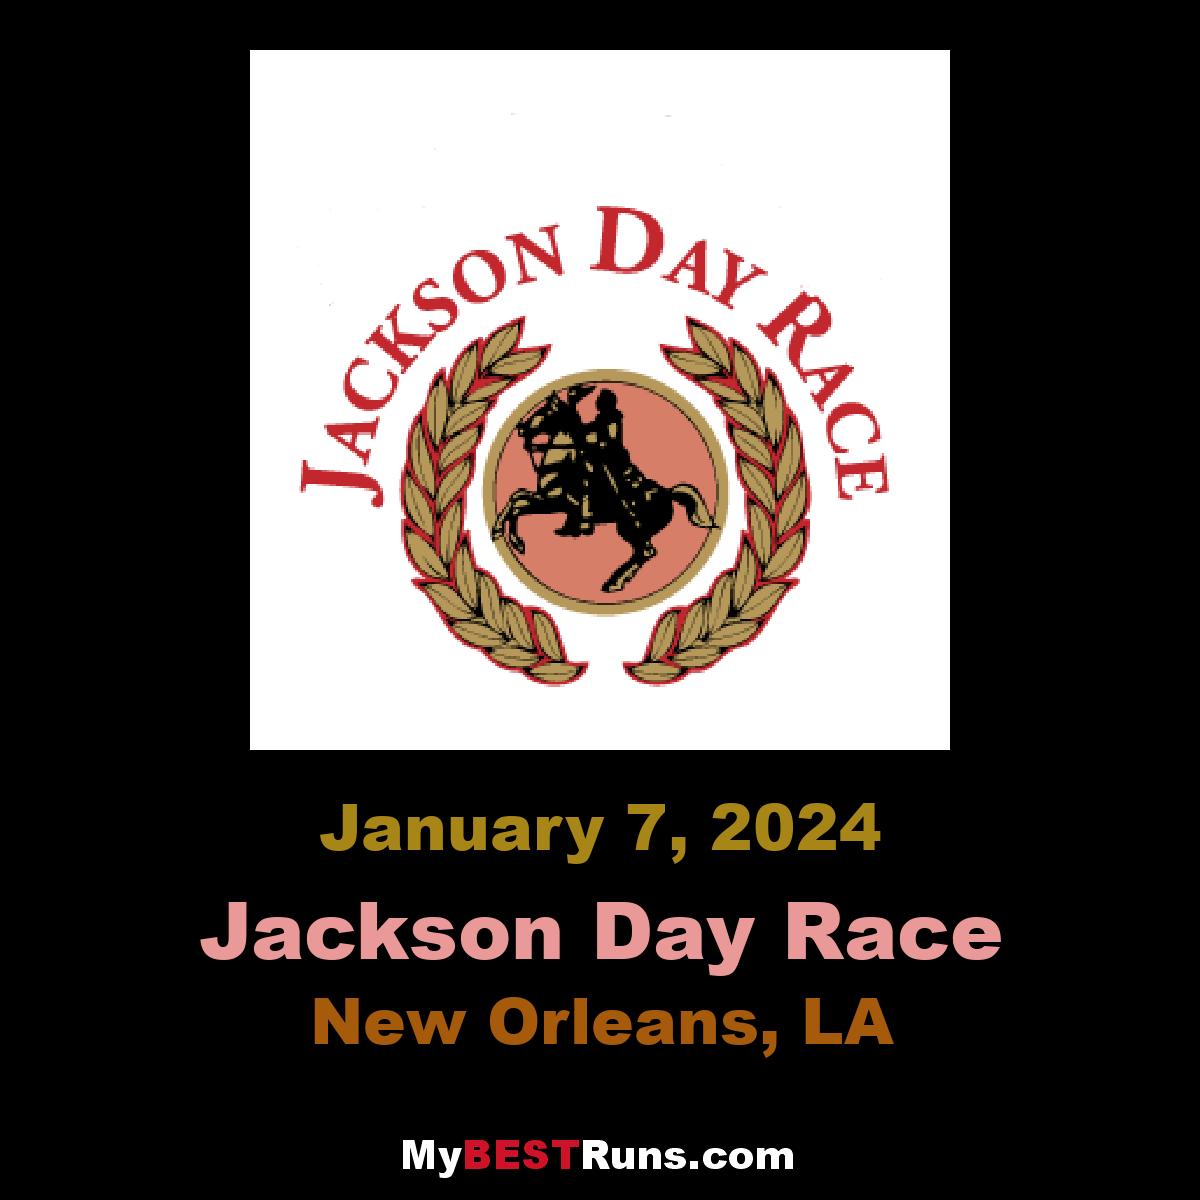 Jackson Day Race